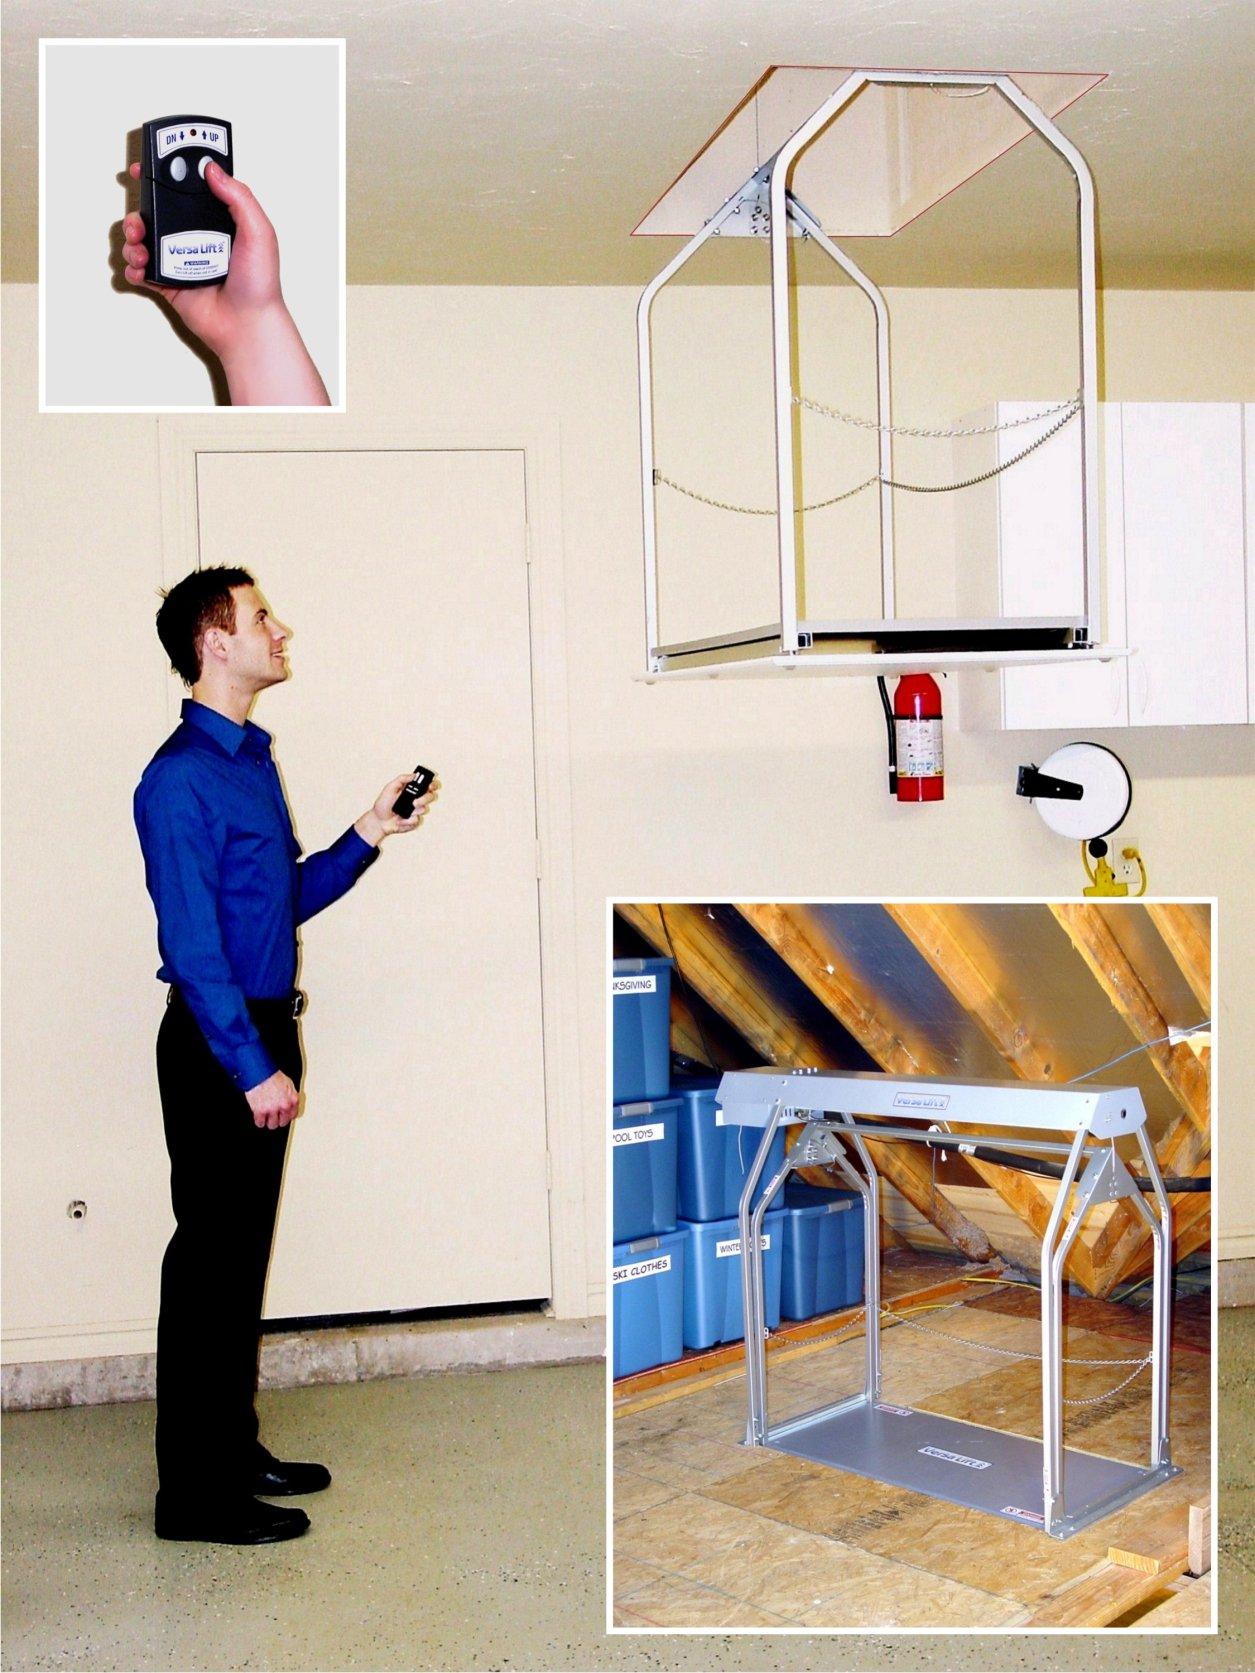 Versa Lift Storage Lift - 11-14ft. Lift, Wireless Remote Control, Model# 24WFH